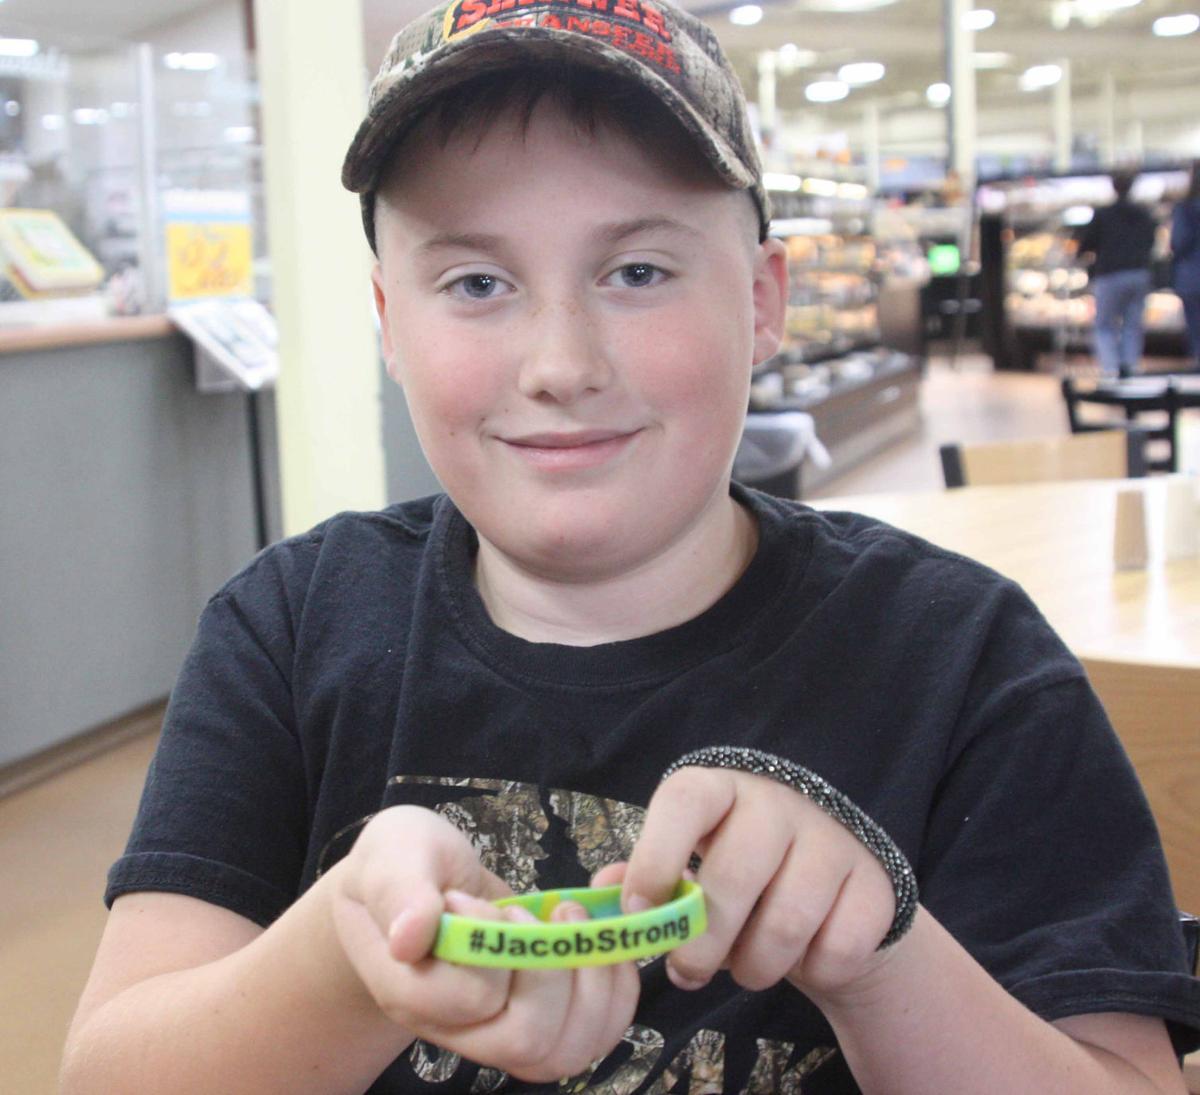 Jacob shows bracelet